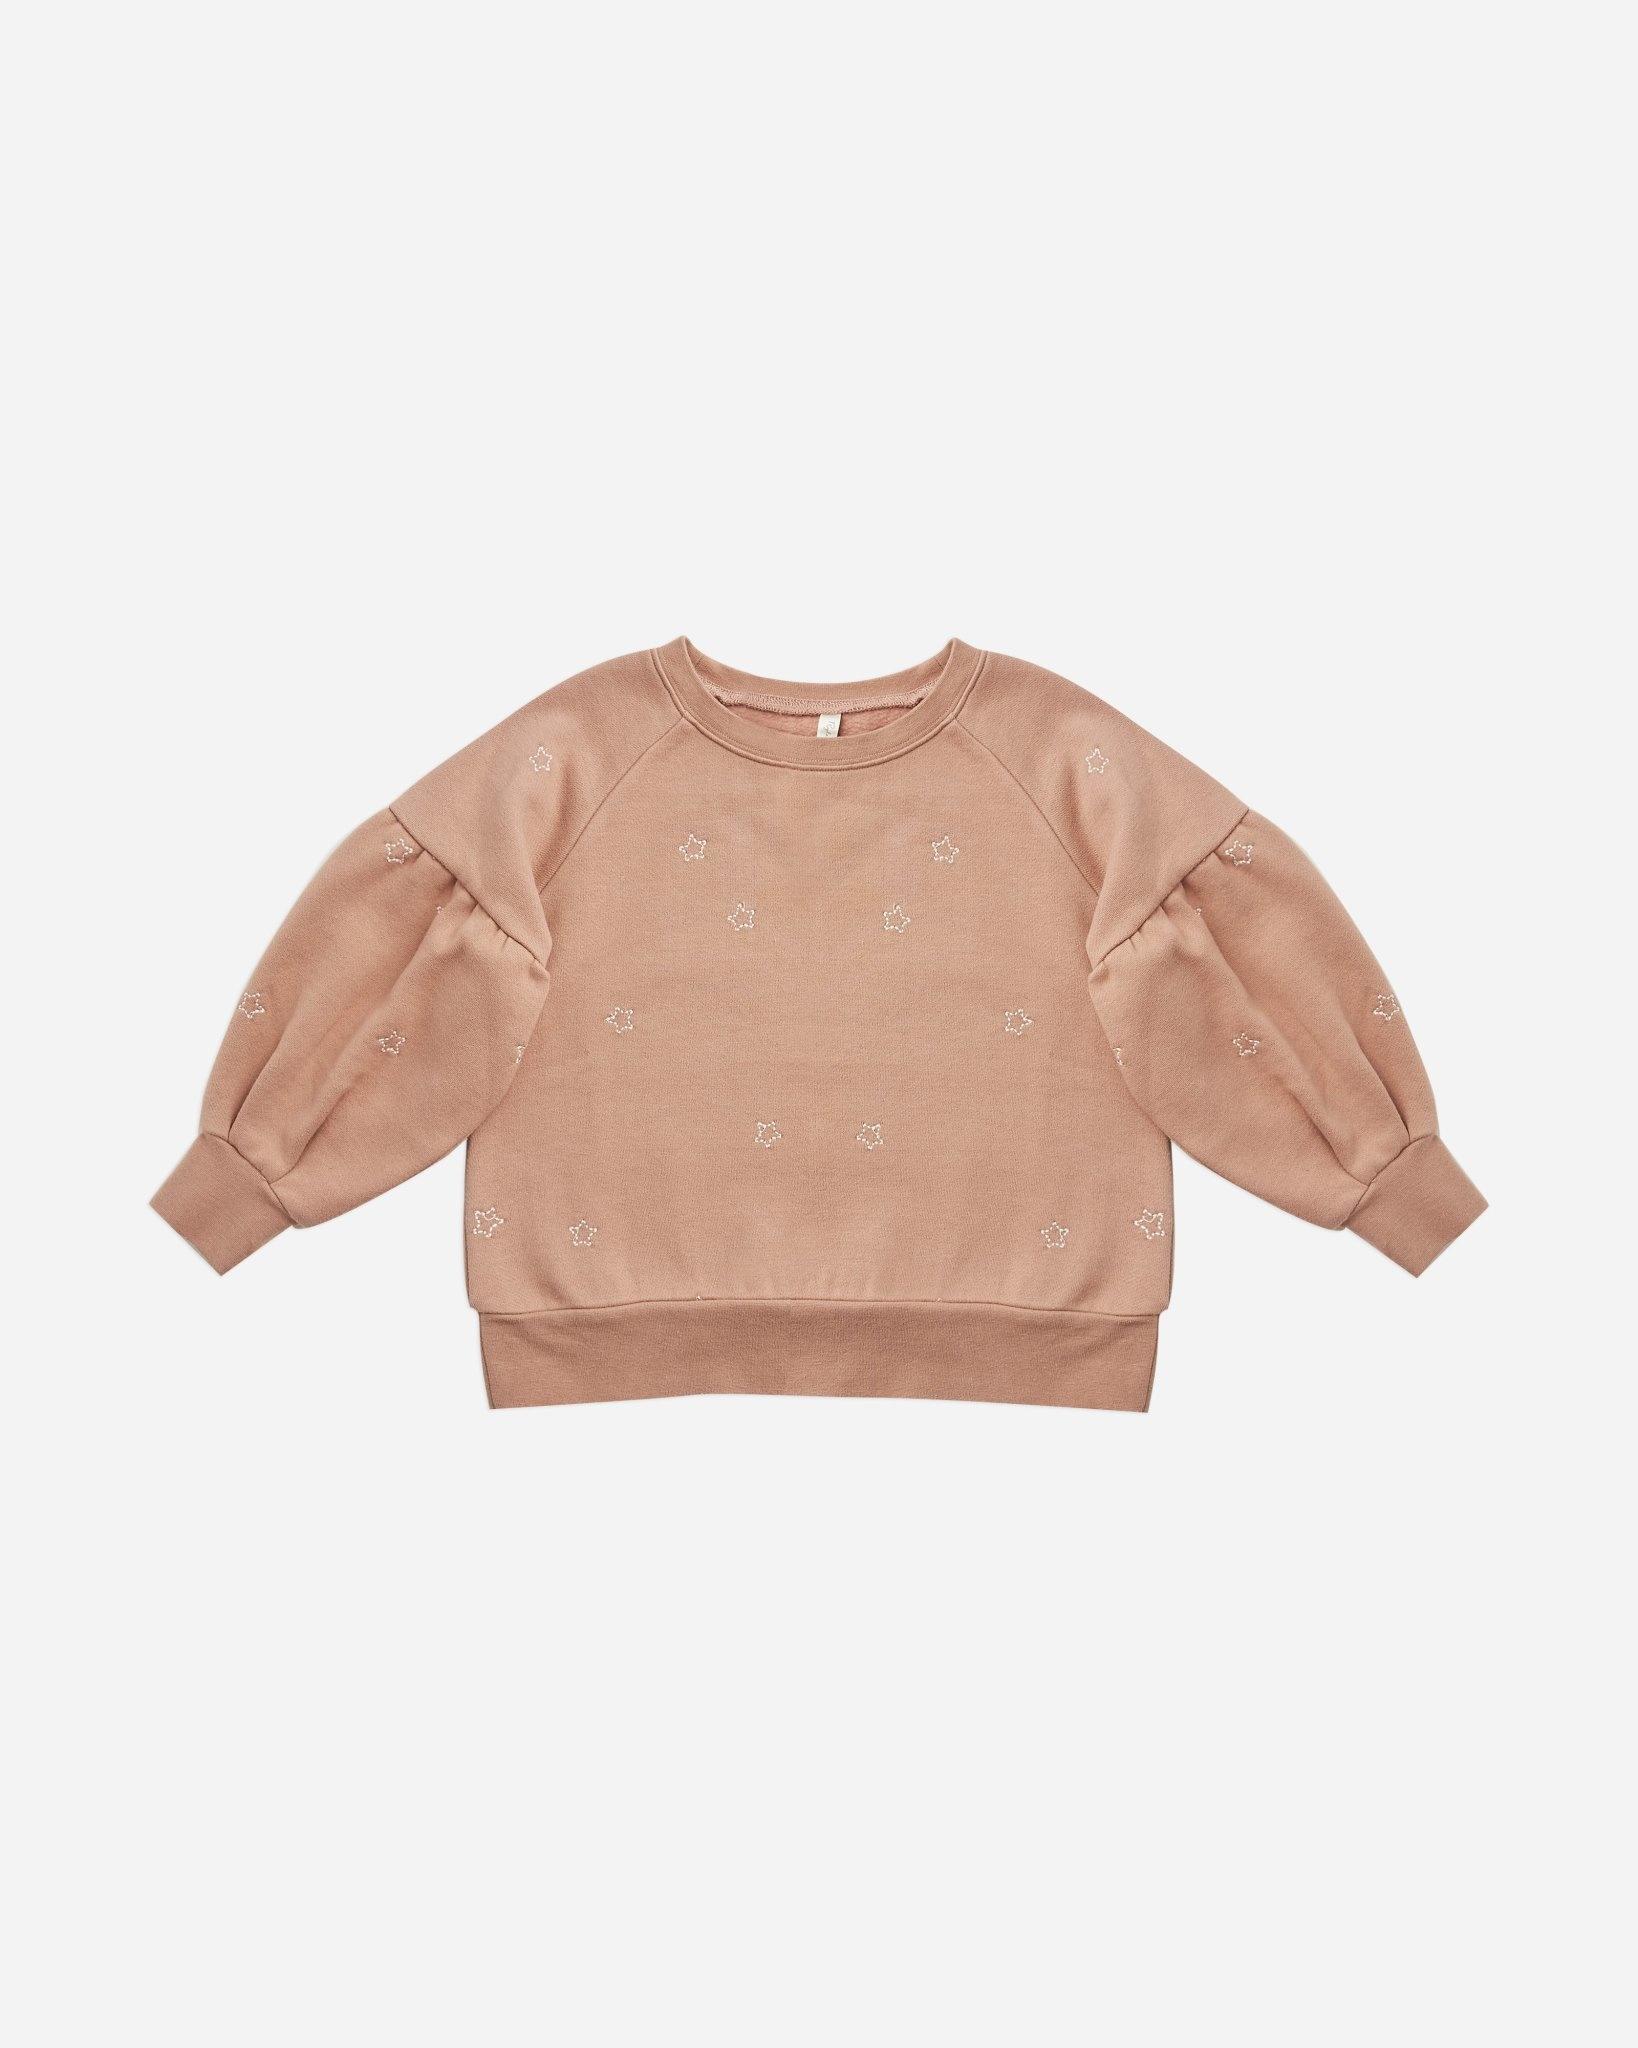 Rylee & Cru Stars Puff Sleeve Sweatshirt